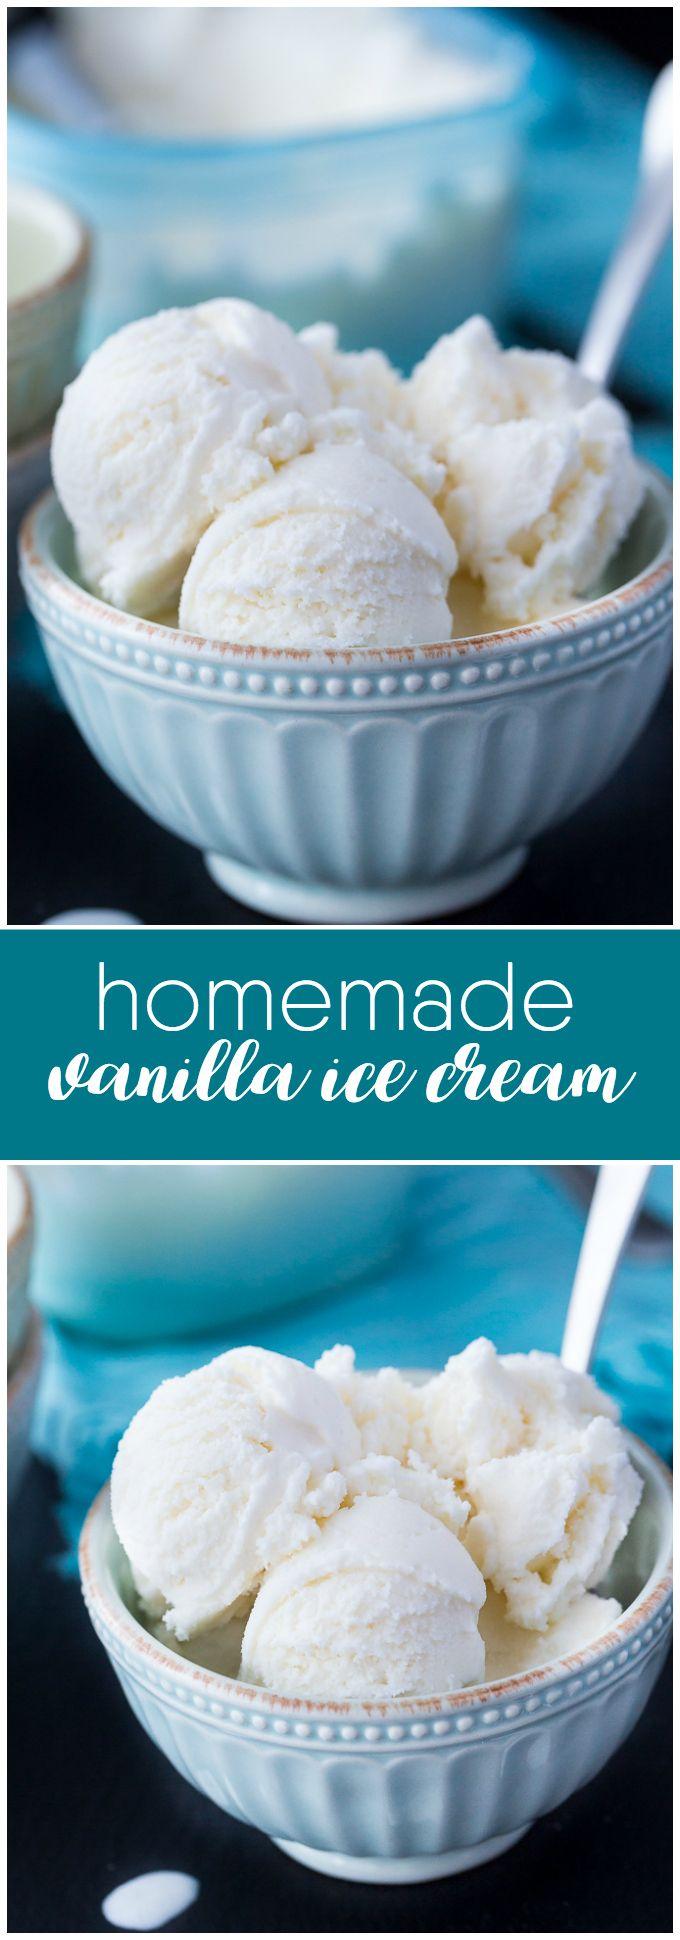 Homemade Vanilla Ice Cream - Creamy and indulgent with a pure sweet vanilla flavour.